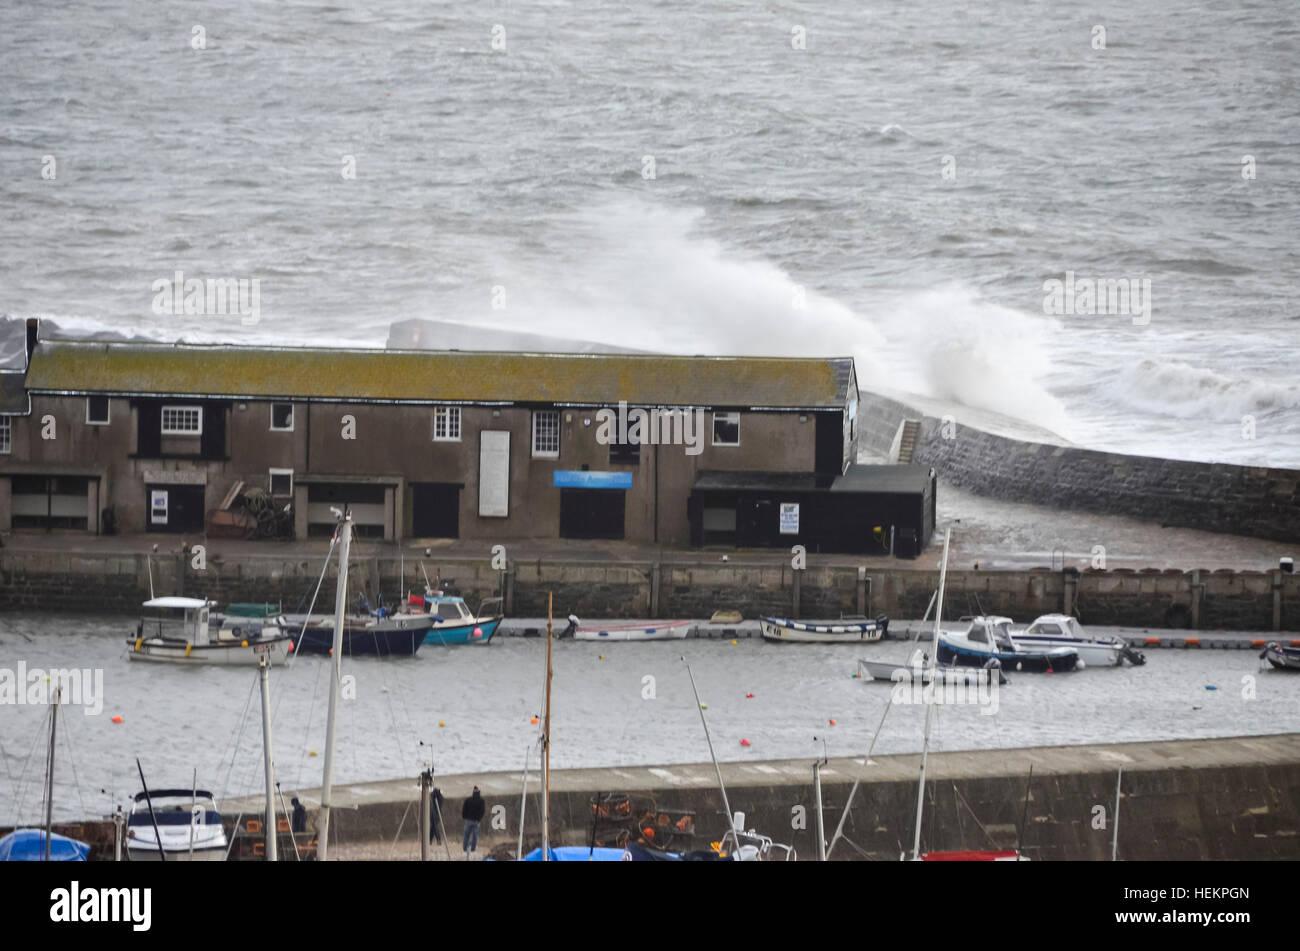 Lyme Regis, Dorset, UK. 23rd Dec, 2016. Weather. Large waves crash against the historic Cobb Harbour wall at Lyme Stock Photo